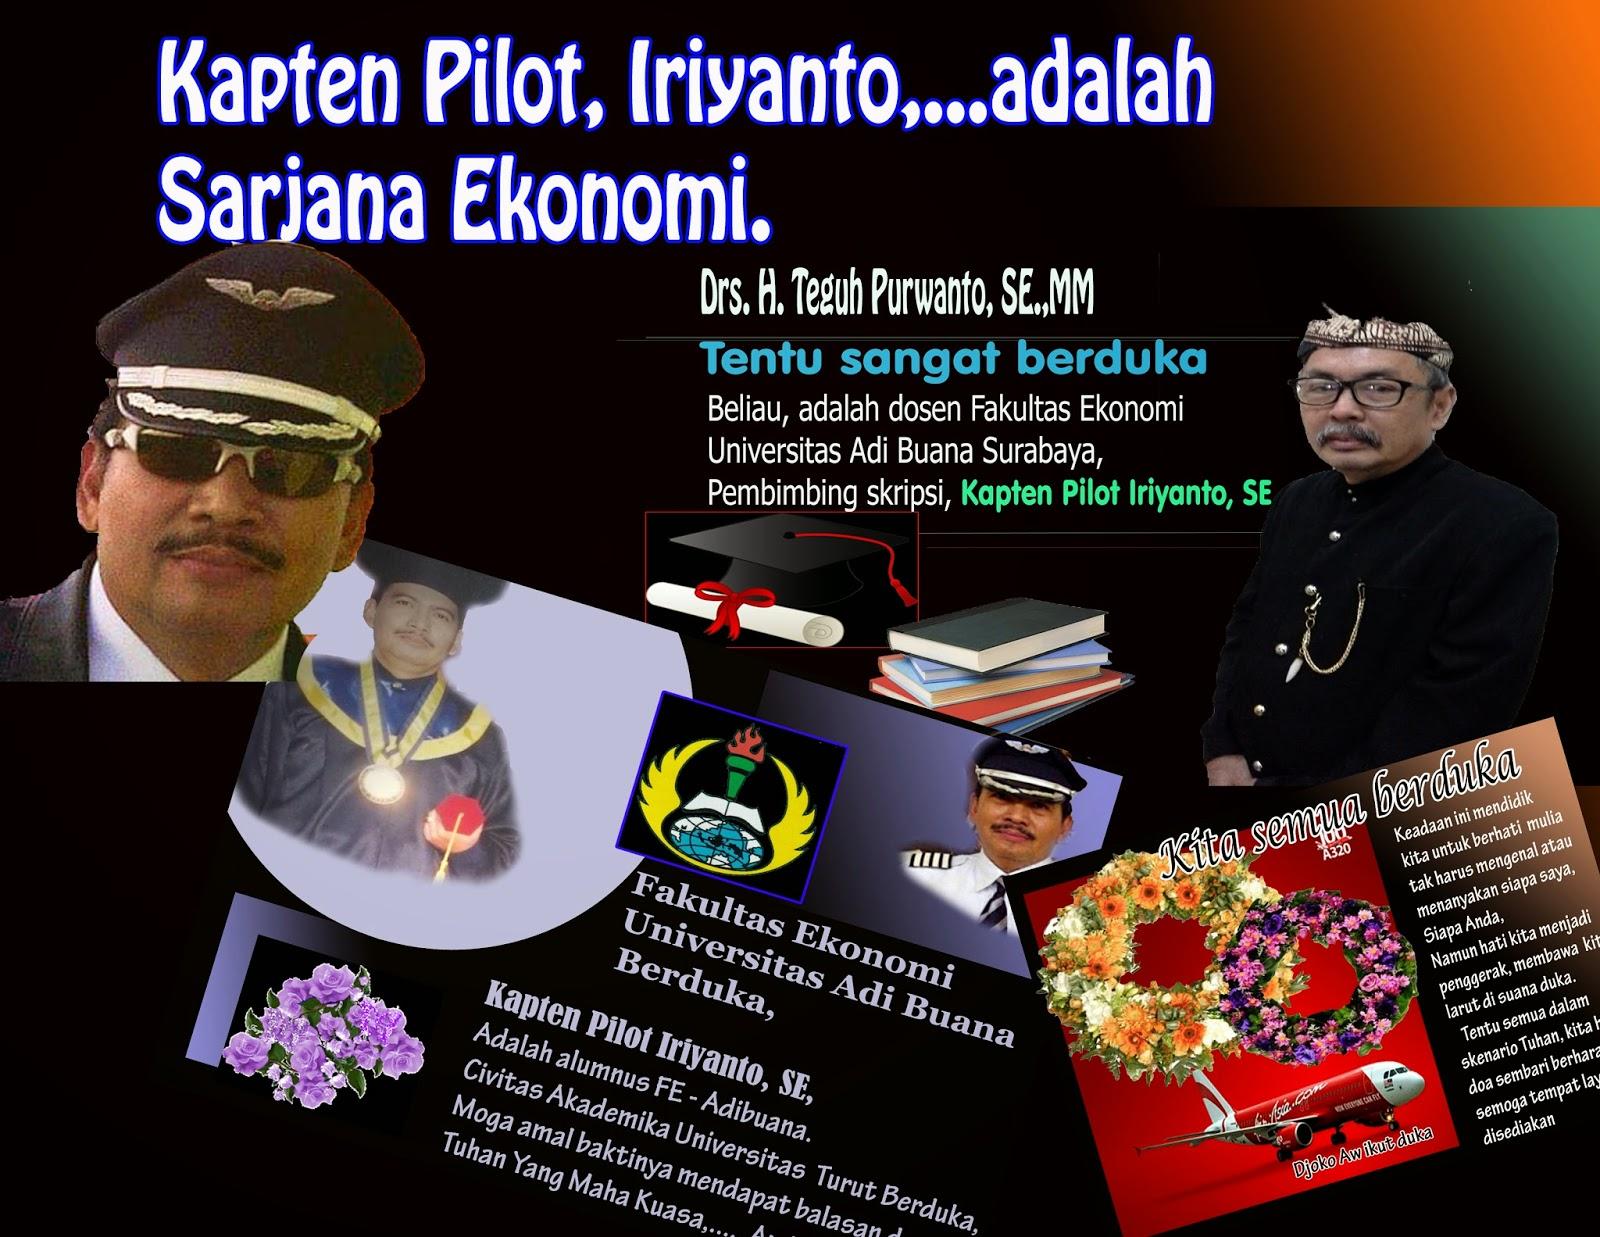 sarjana ekonomi Ikatan sarjana ekonomi indonesia (isei) mengundang wakil presiden jusuf  kalla (jk) dalam kongres terkait penguatan sektor informal.